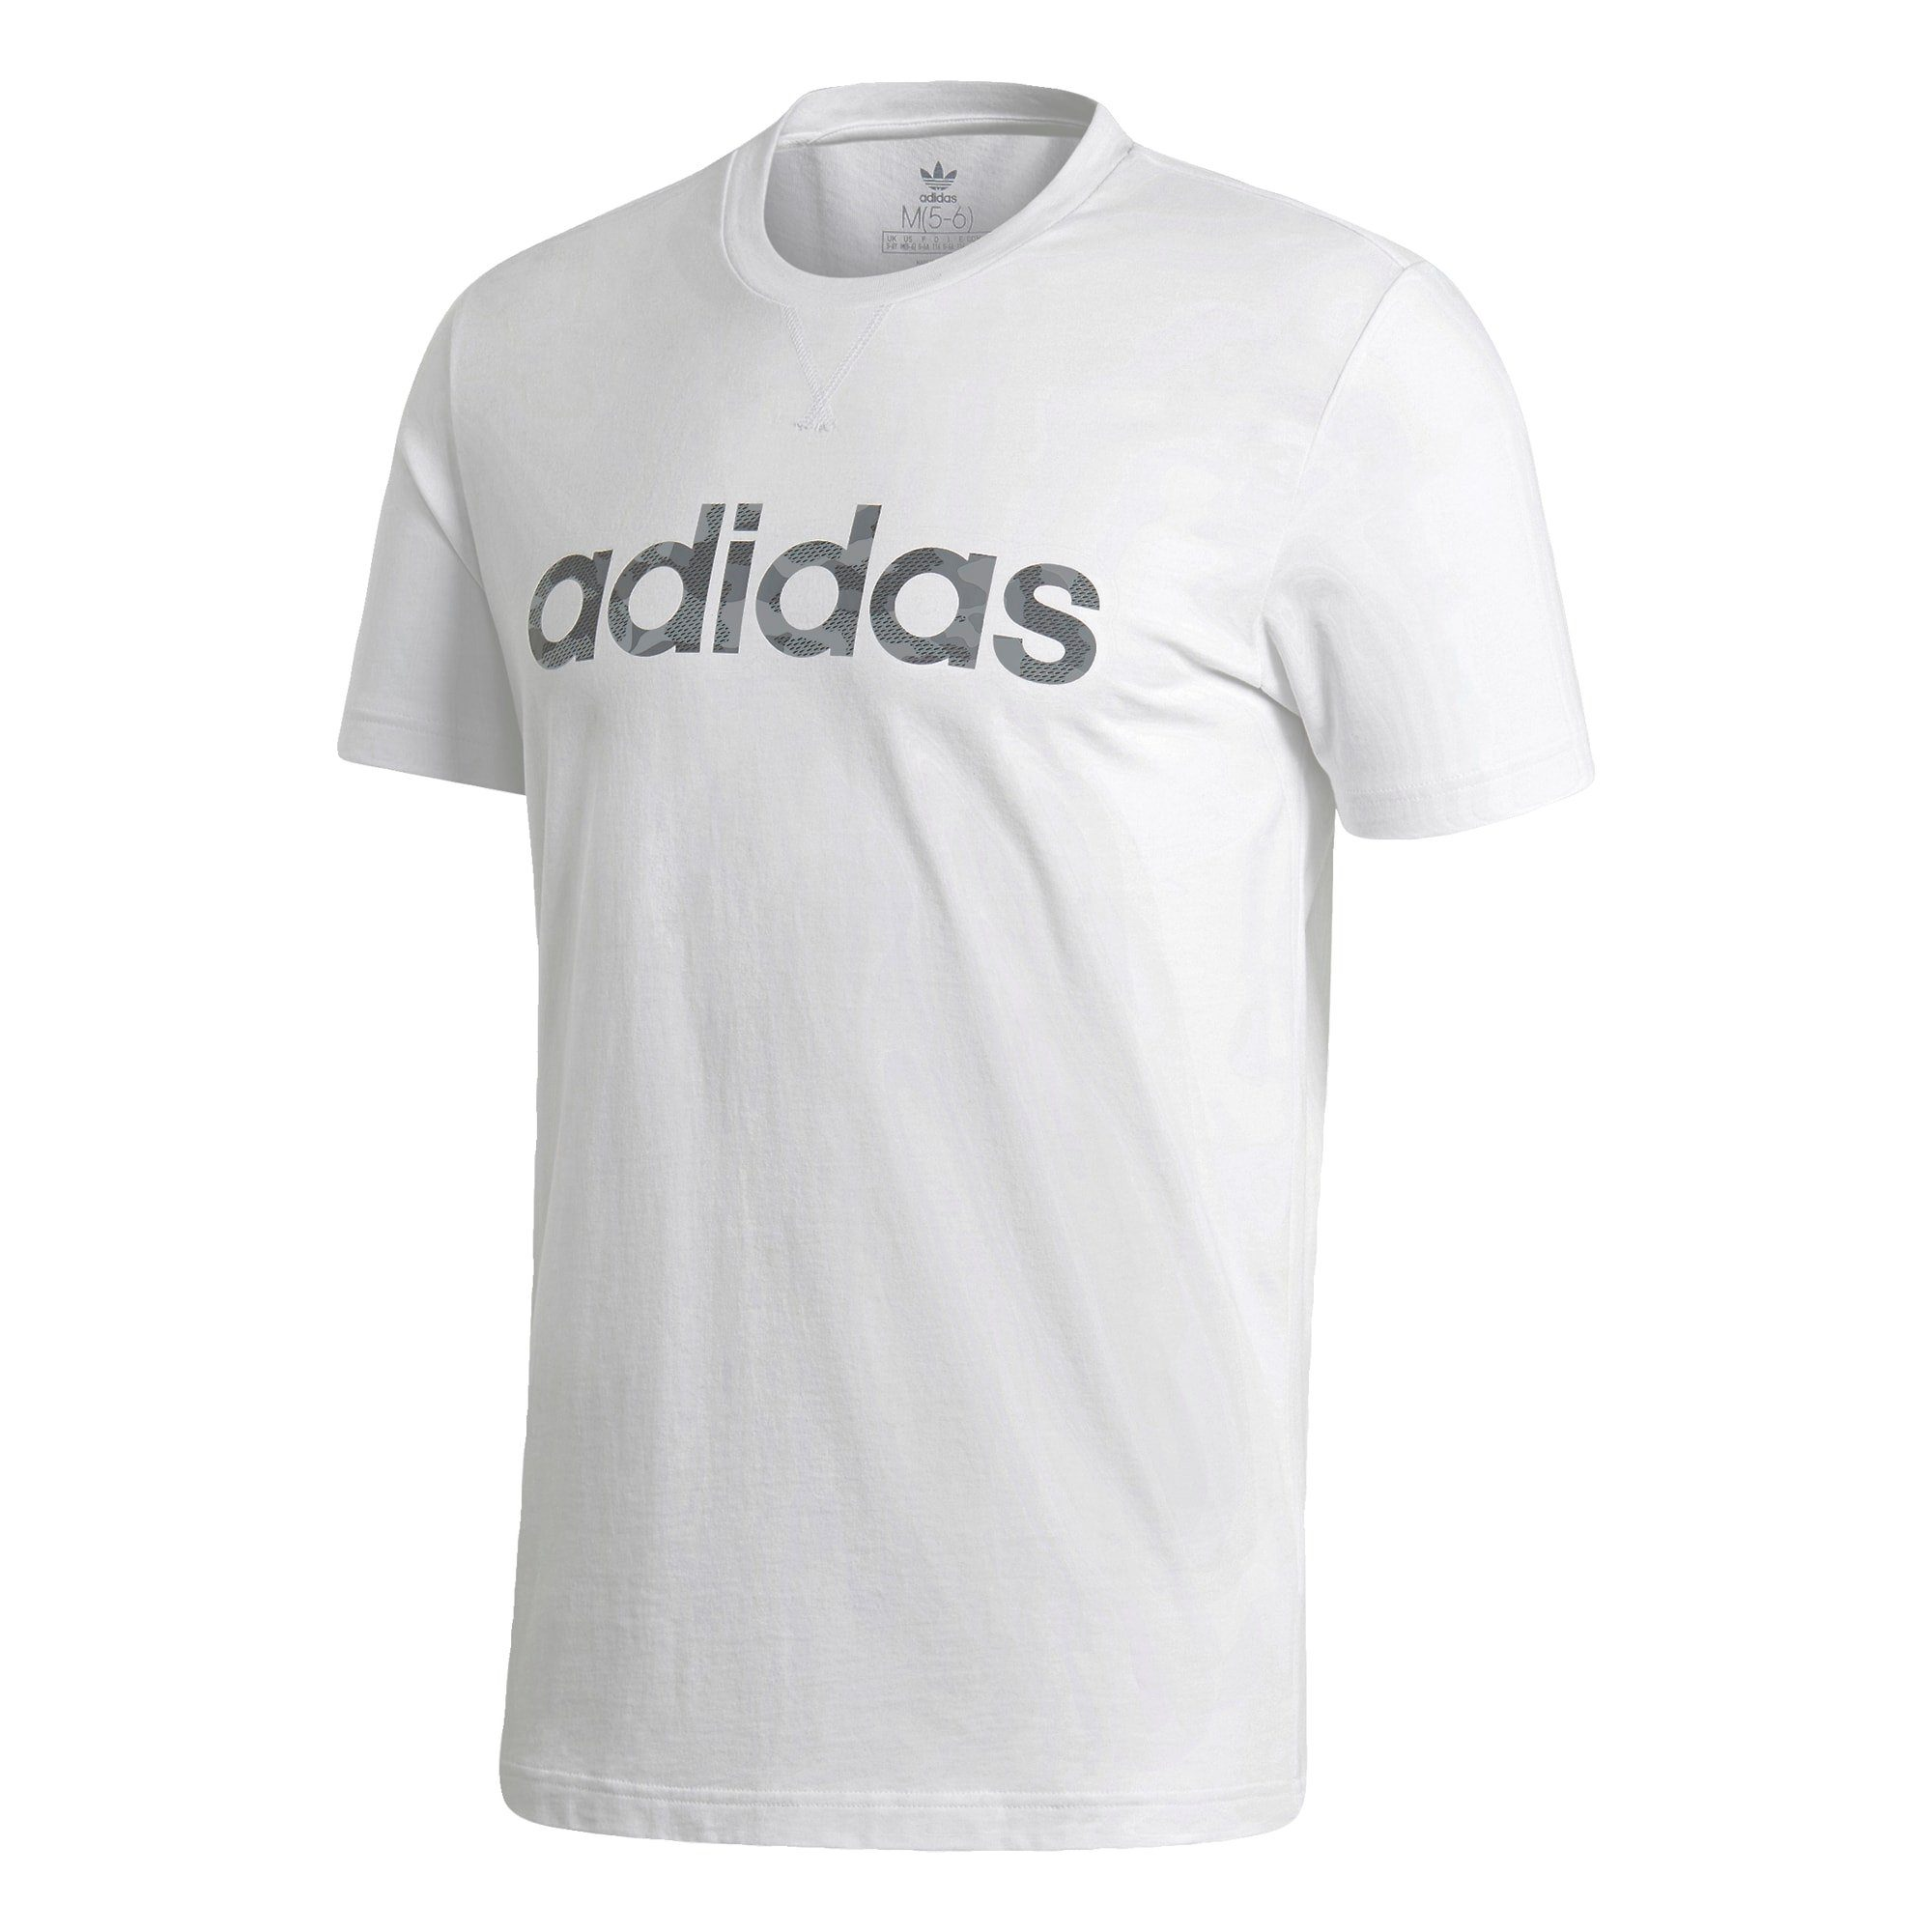 adidas performance t-shirt essentials t-shirt